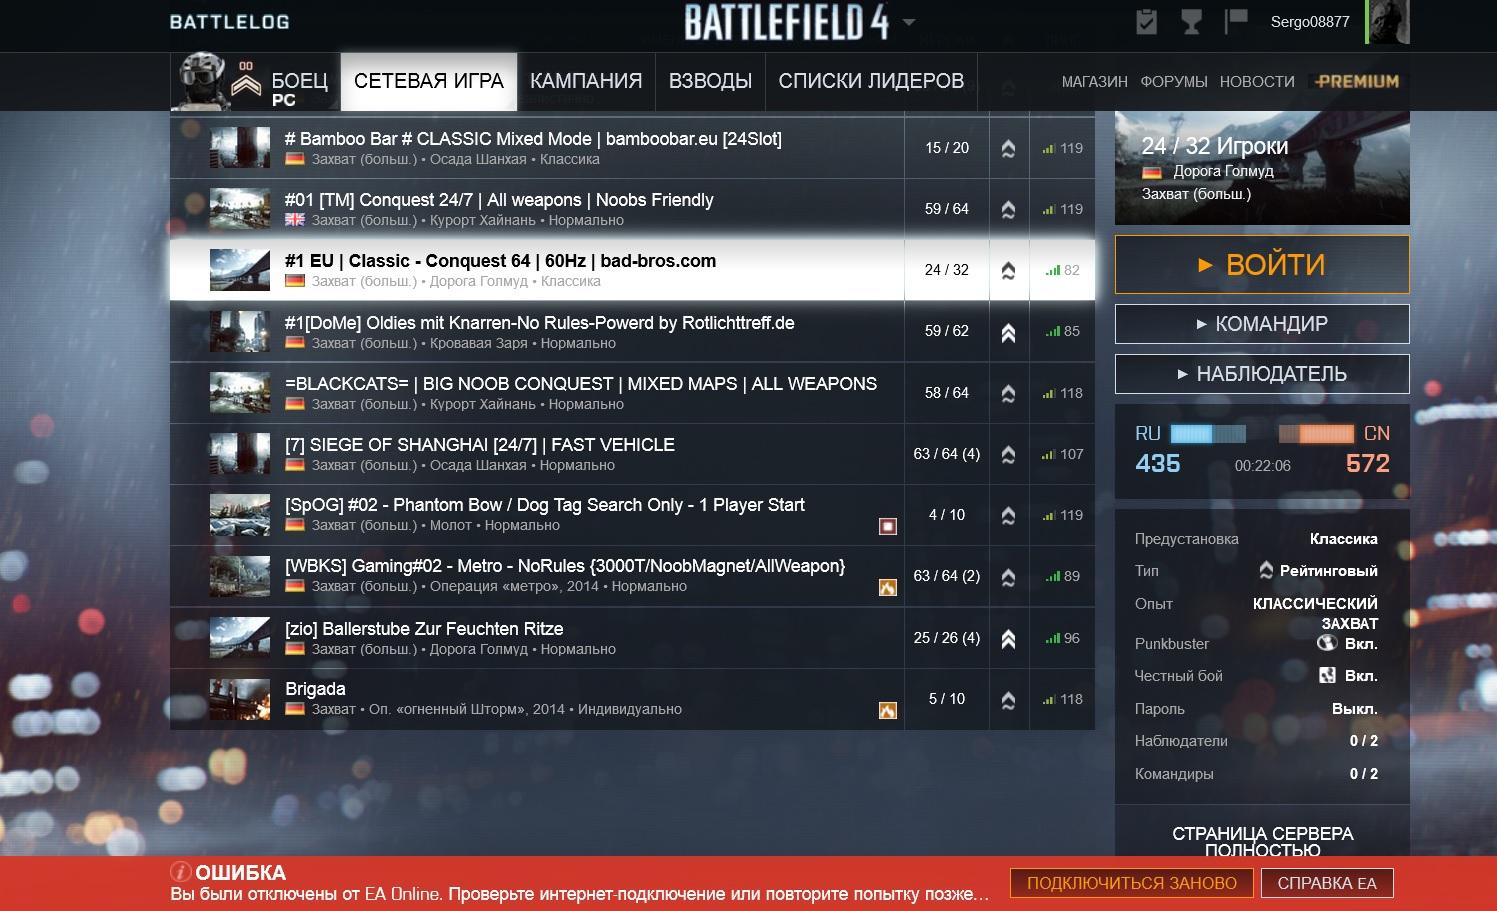 Настройка сервера battlefield 4